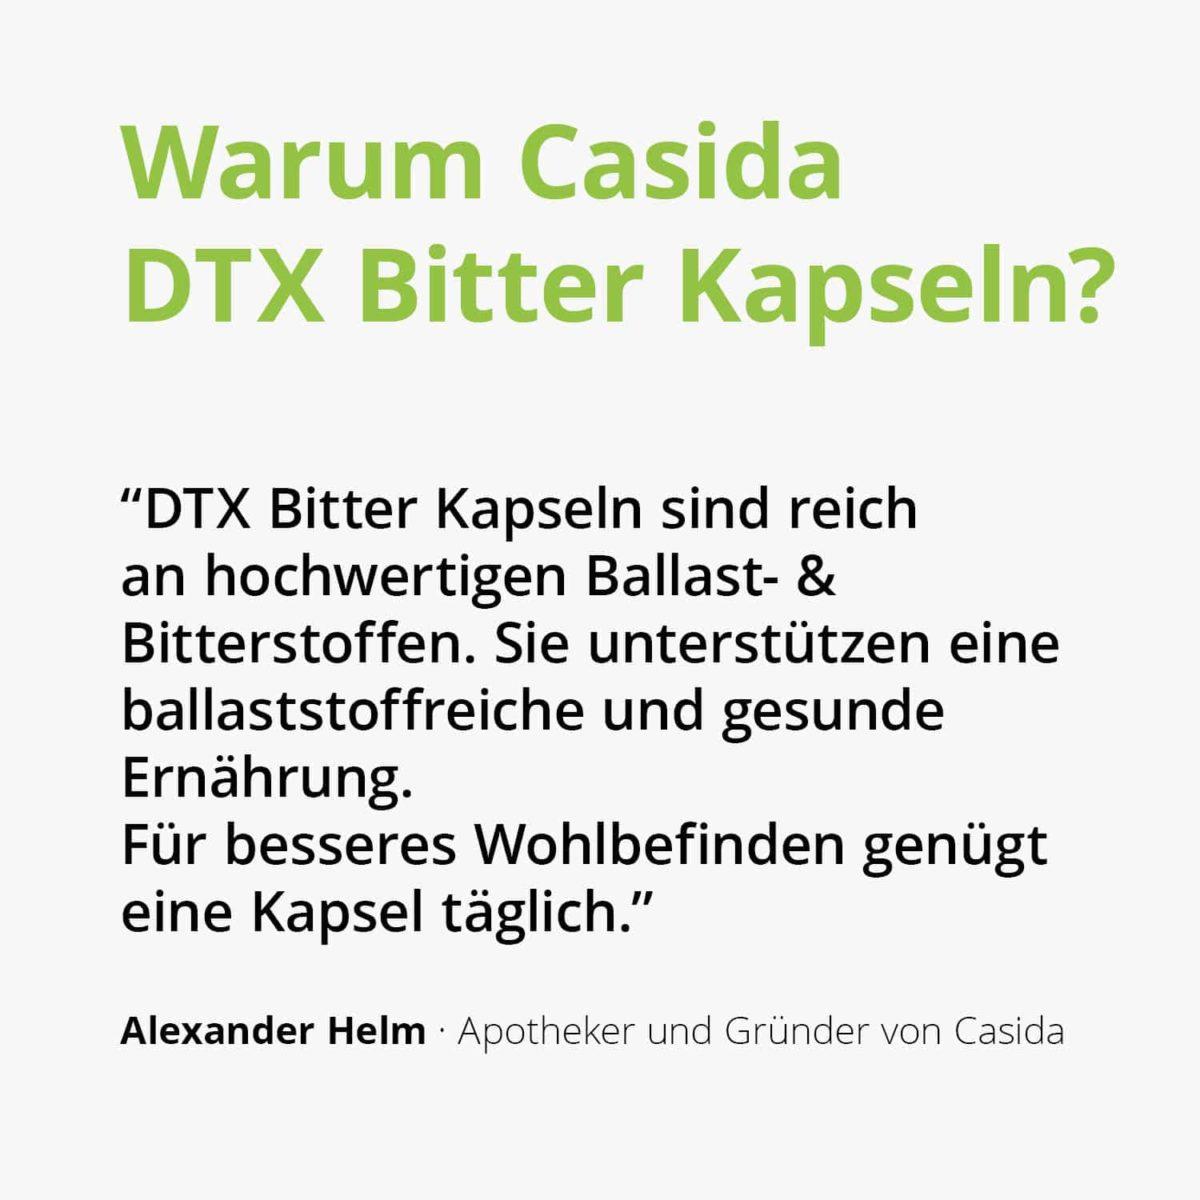 Casida DTX Bitter Kapseln 60 Stück PZN 17175086 Apotheke Flohsamen, Grüner Tee Extrakt, Leinsamen, Löwenzahnwurzel Darm Leber Galle2